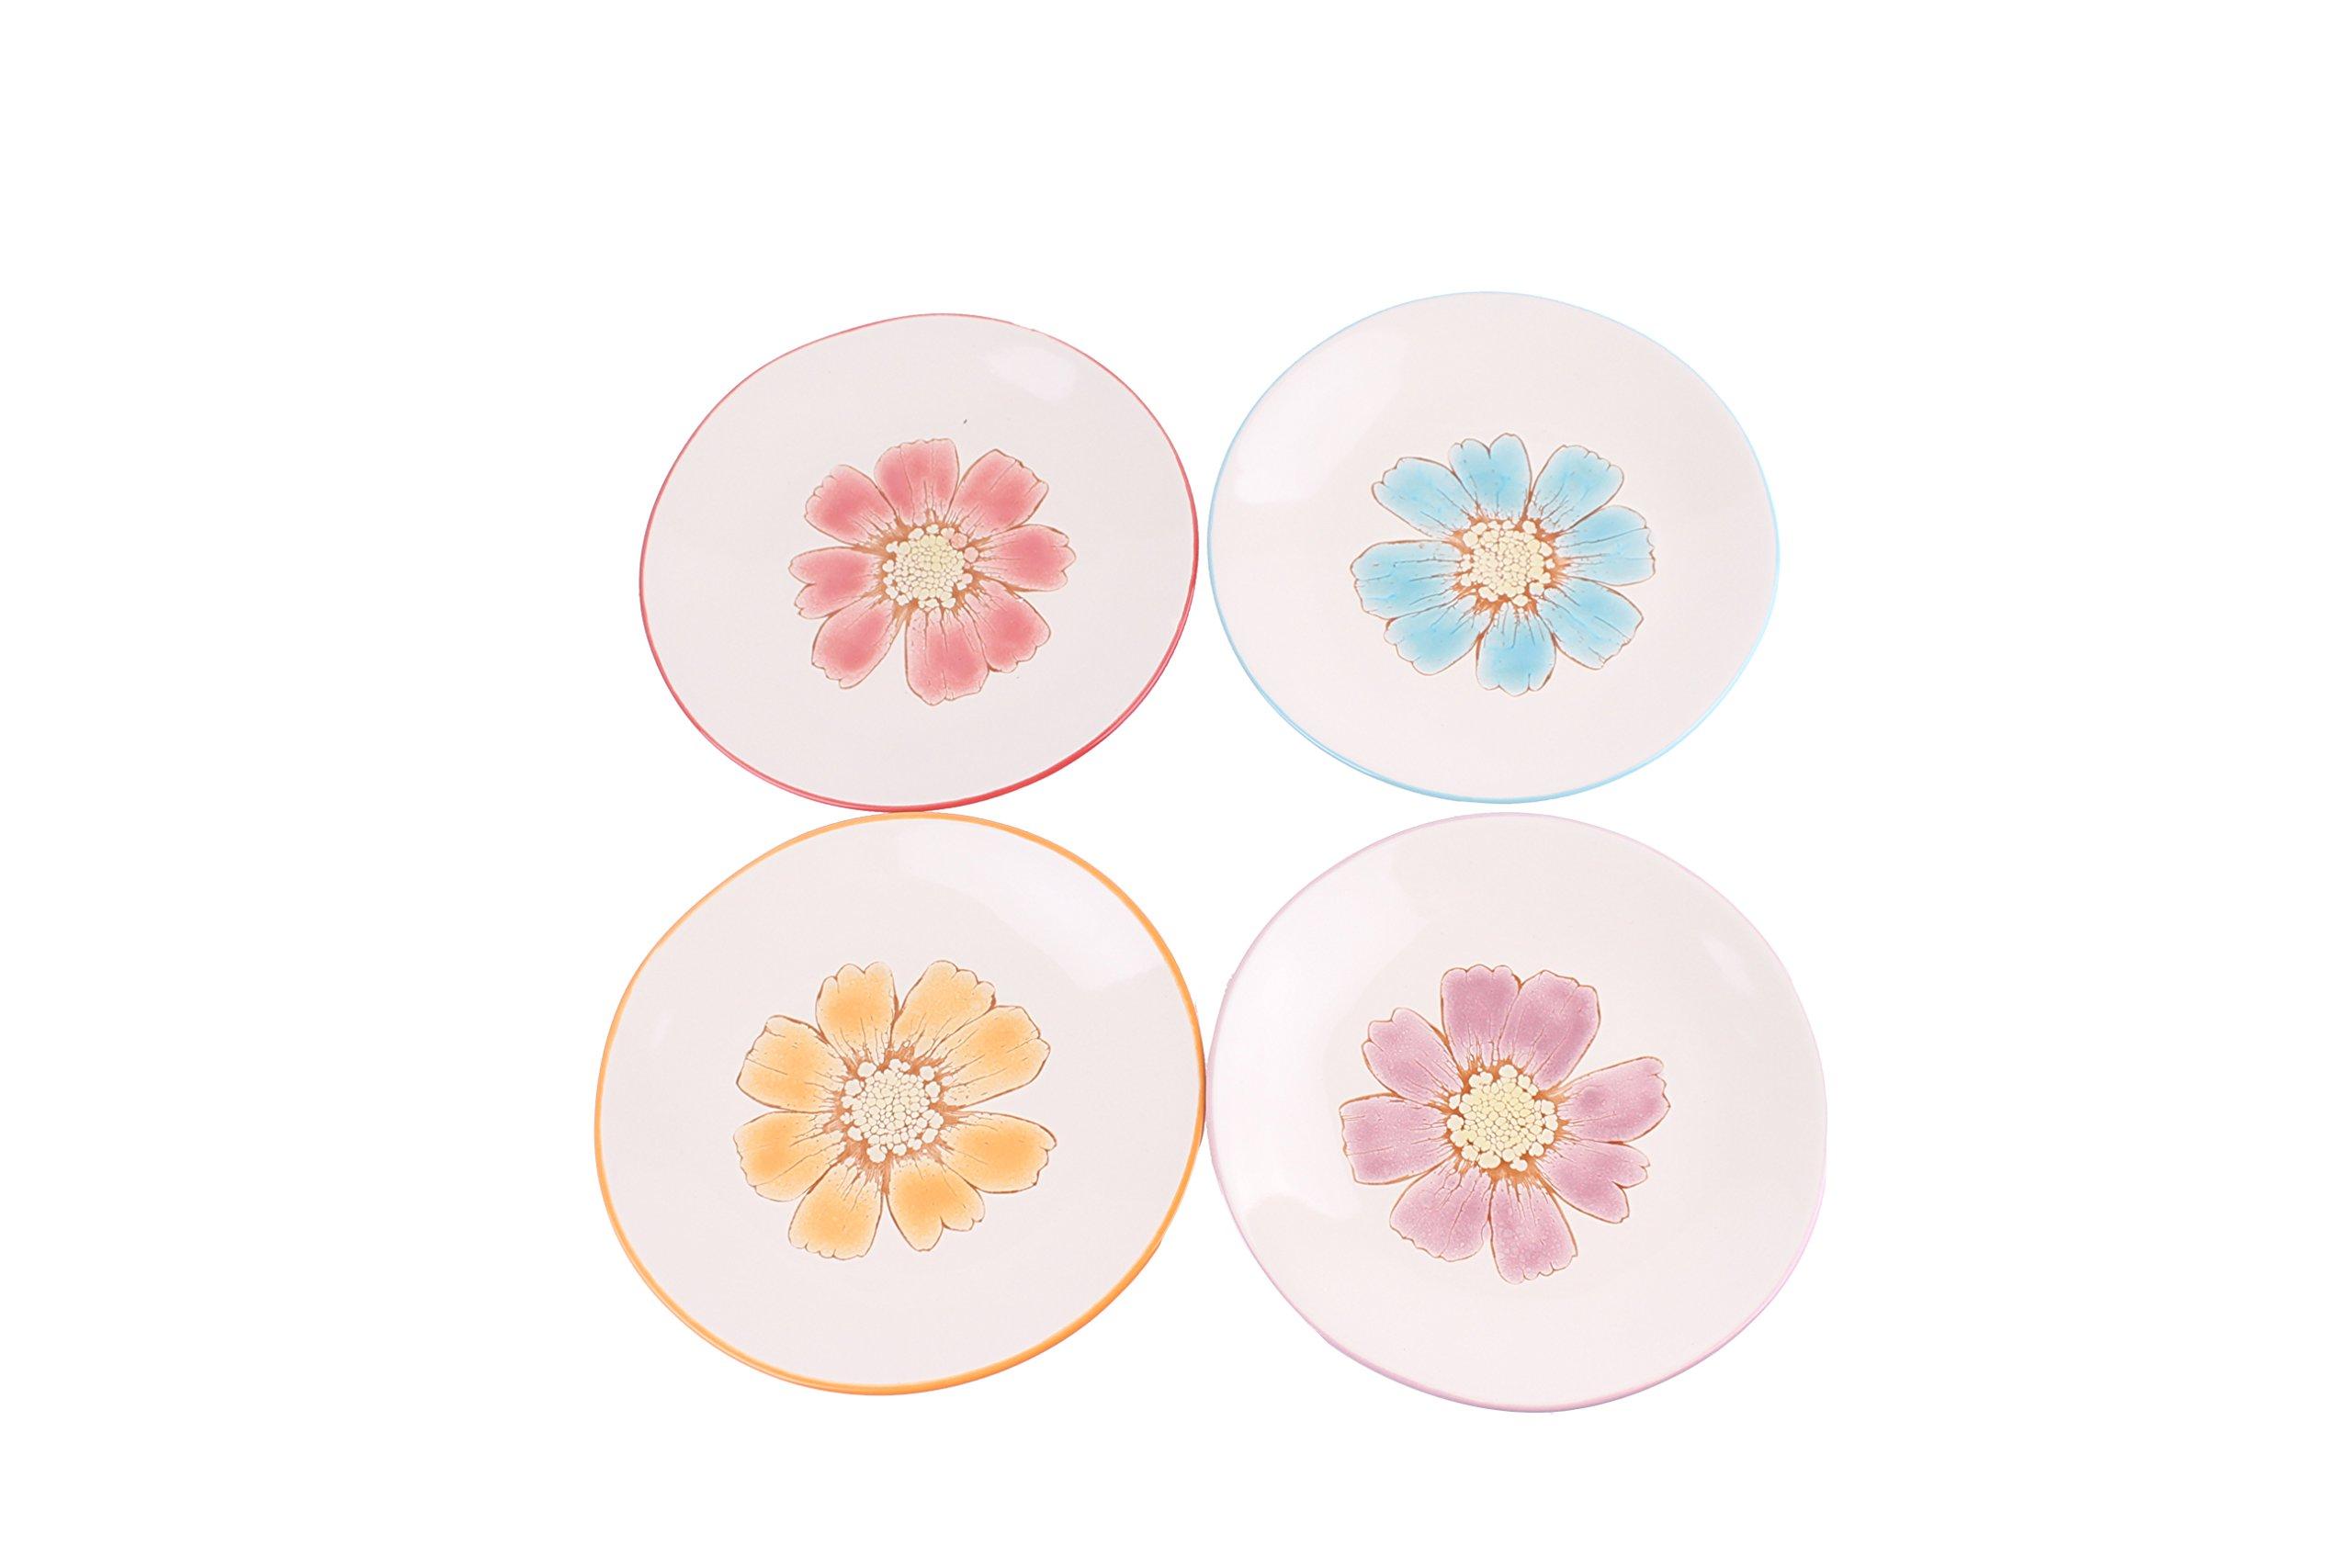 Blue Sky Ceramic Vibrant Daisy Appetizer Plates (Set of 4), 6.5'' by Blue Sky Ceramic